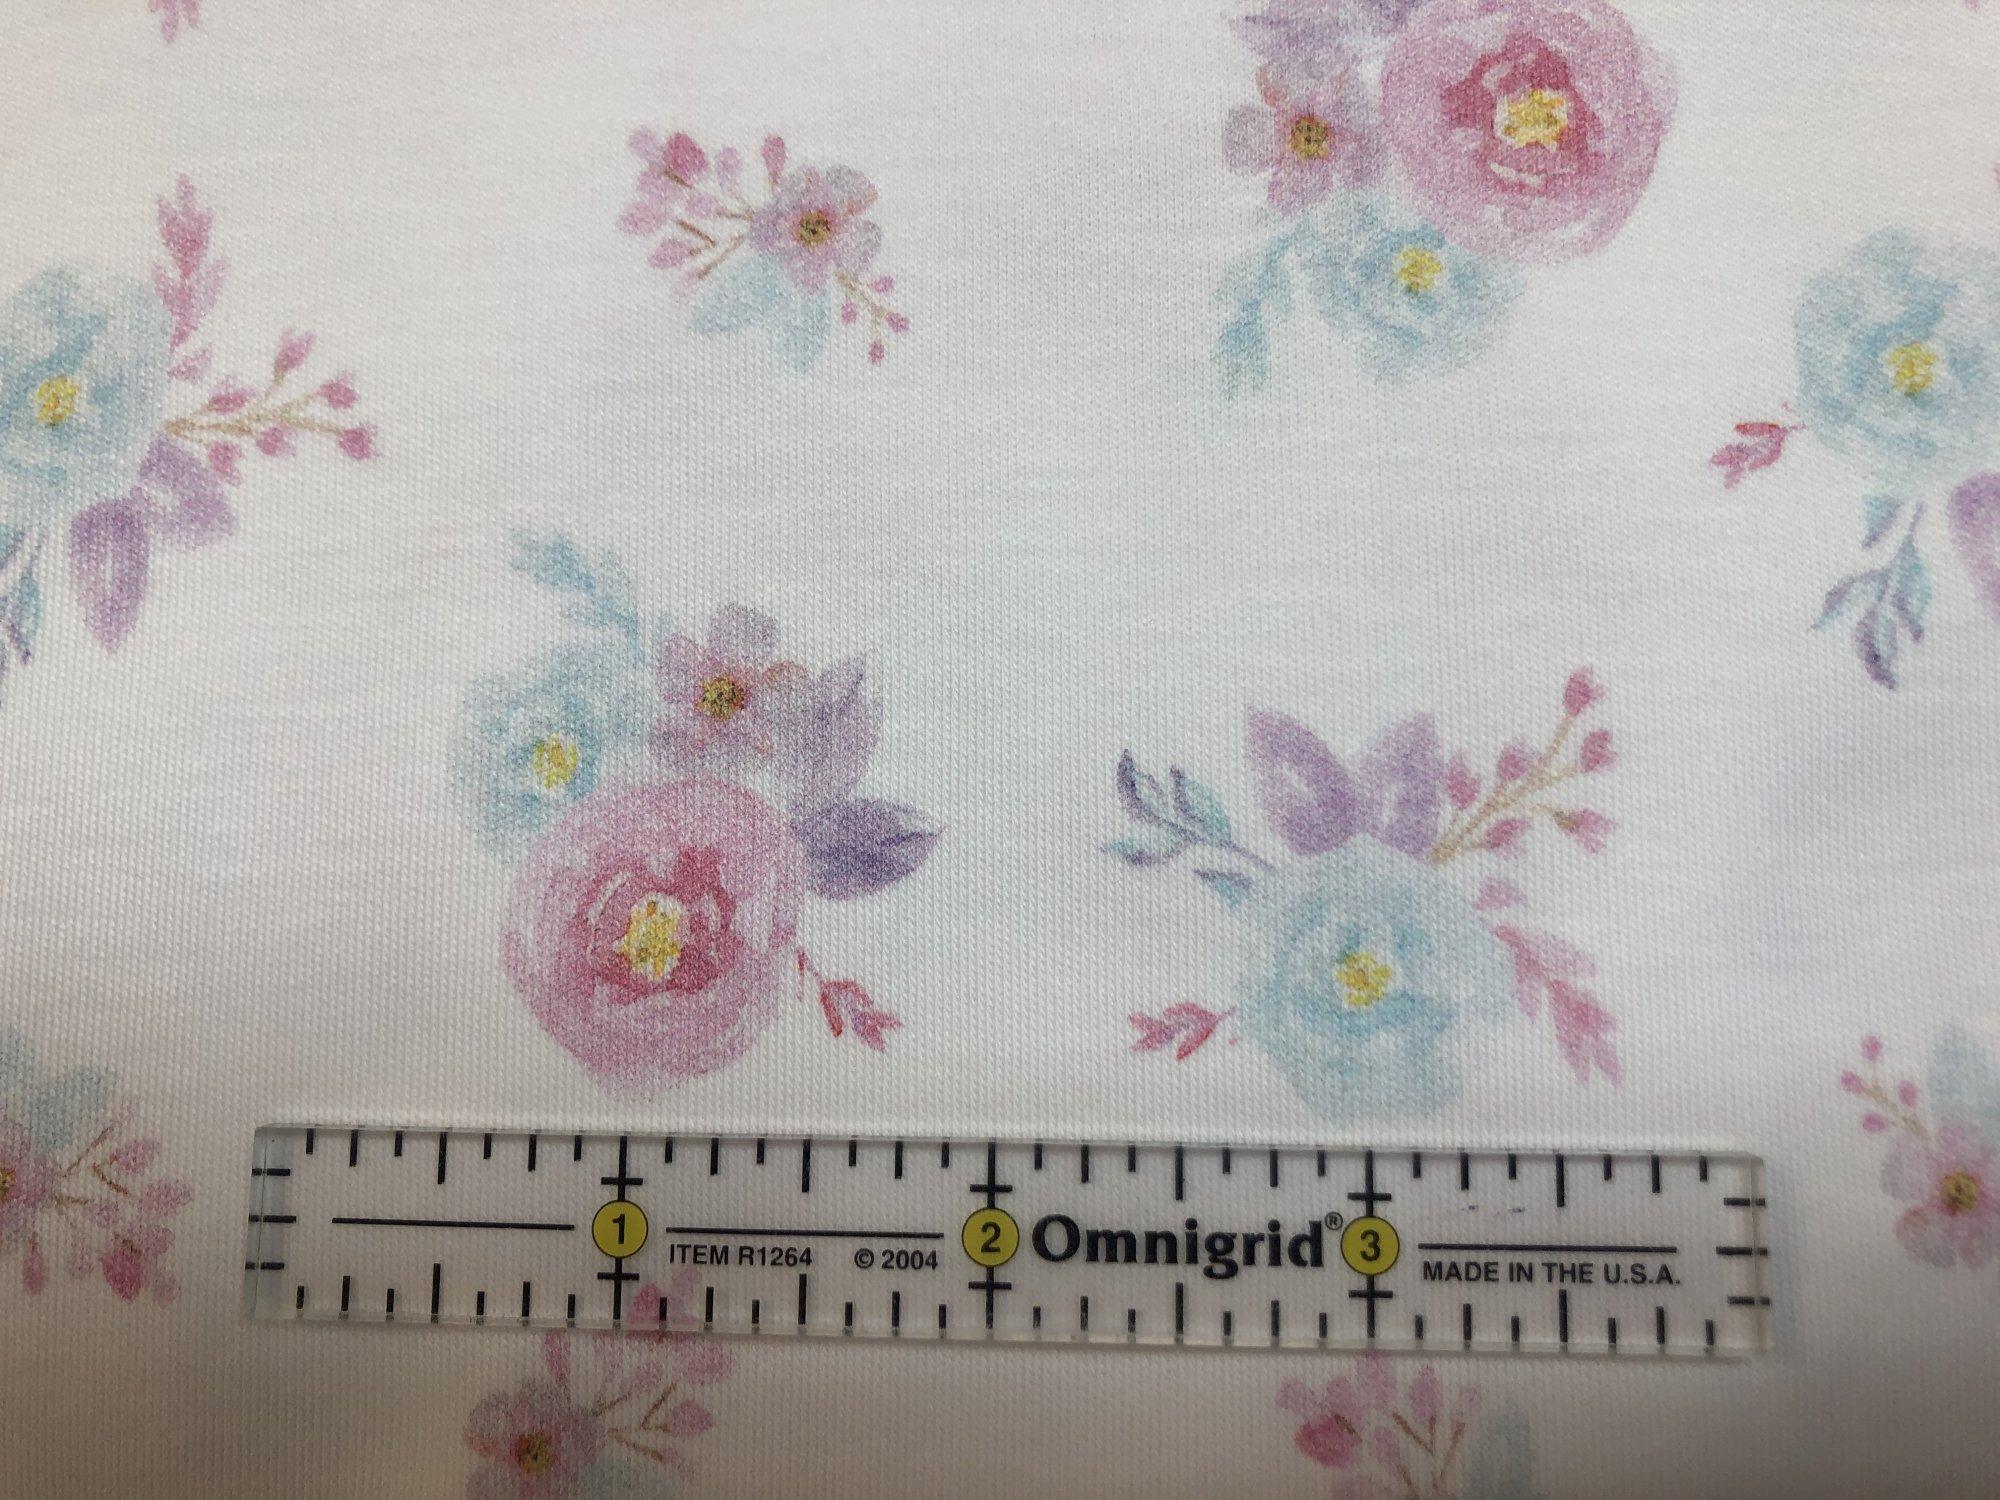 Sea Island Baby Knit Bouquet